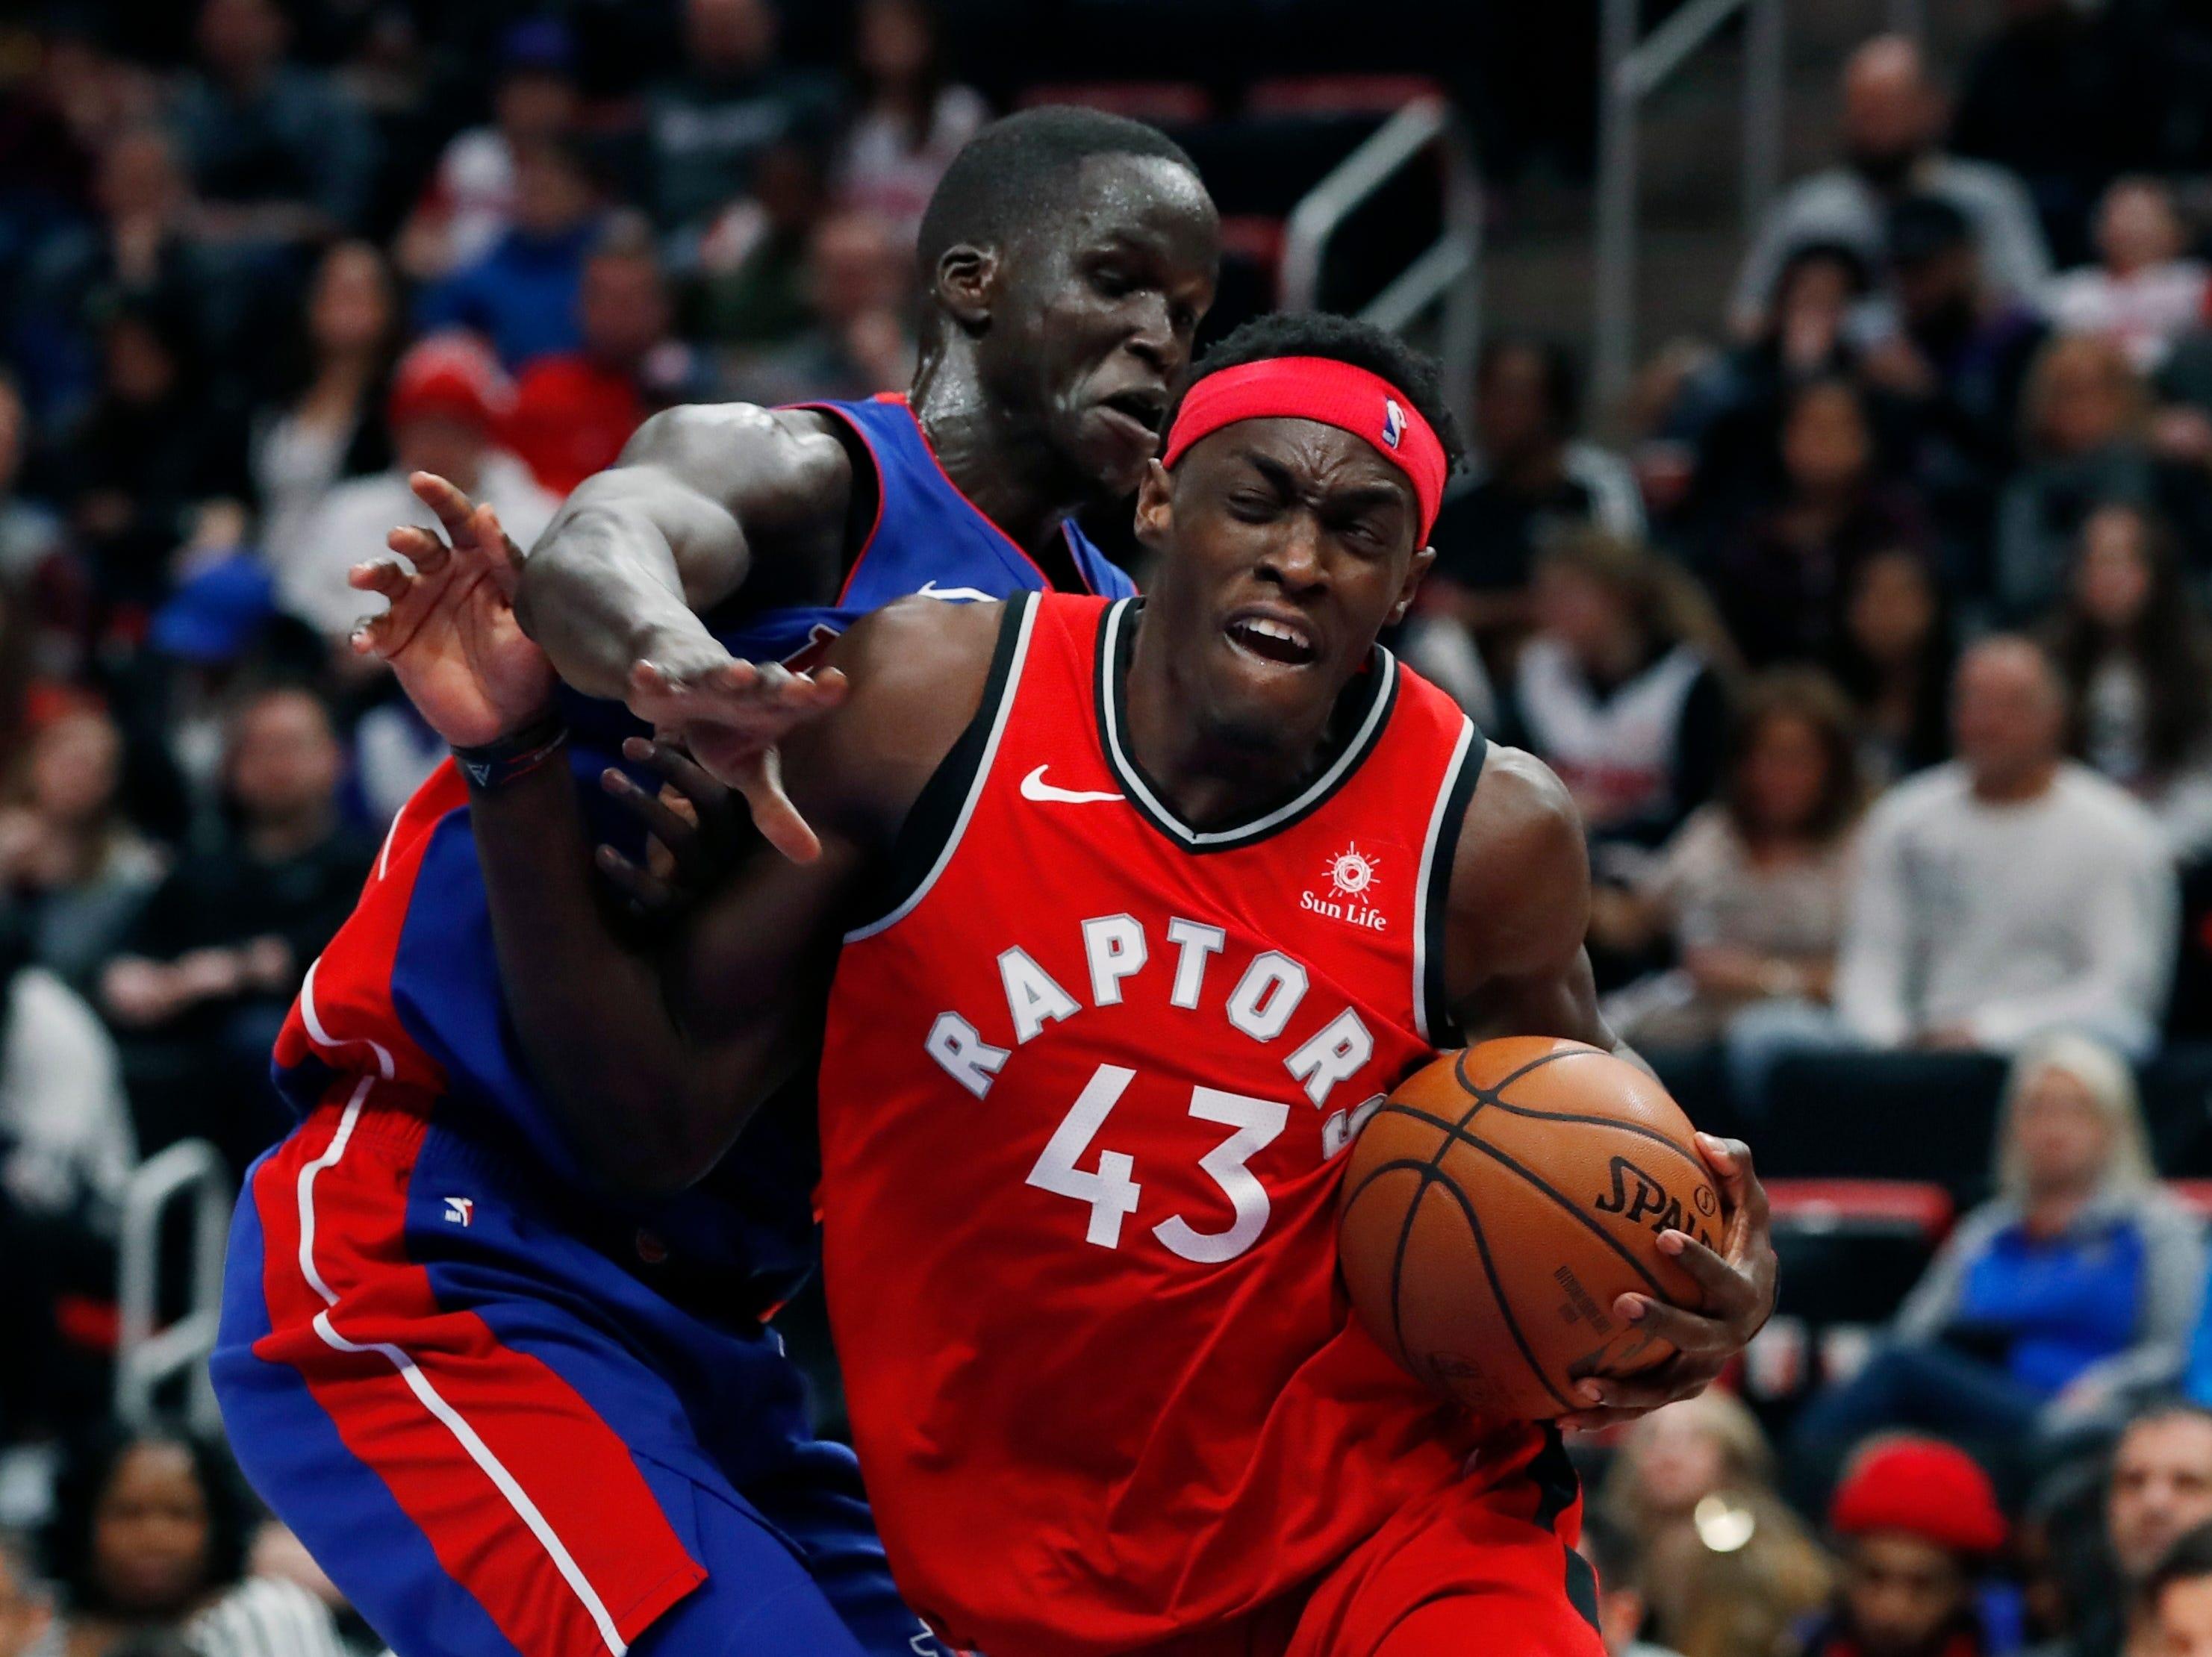 Toronto Raptors forward Pascal Siakam drives on Detroit Pistons forward Thon Maker rebounds during the second half.